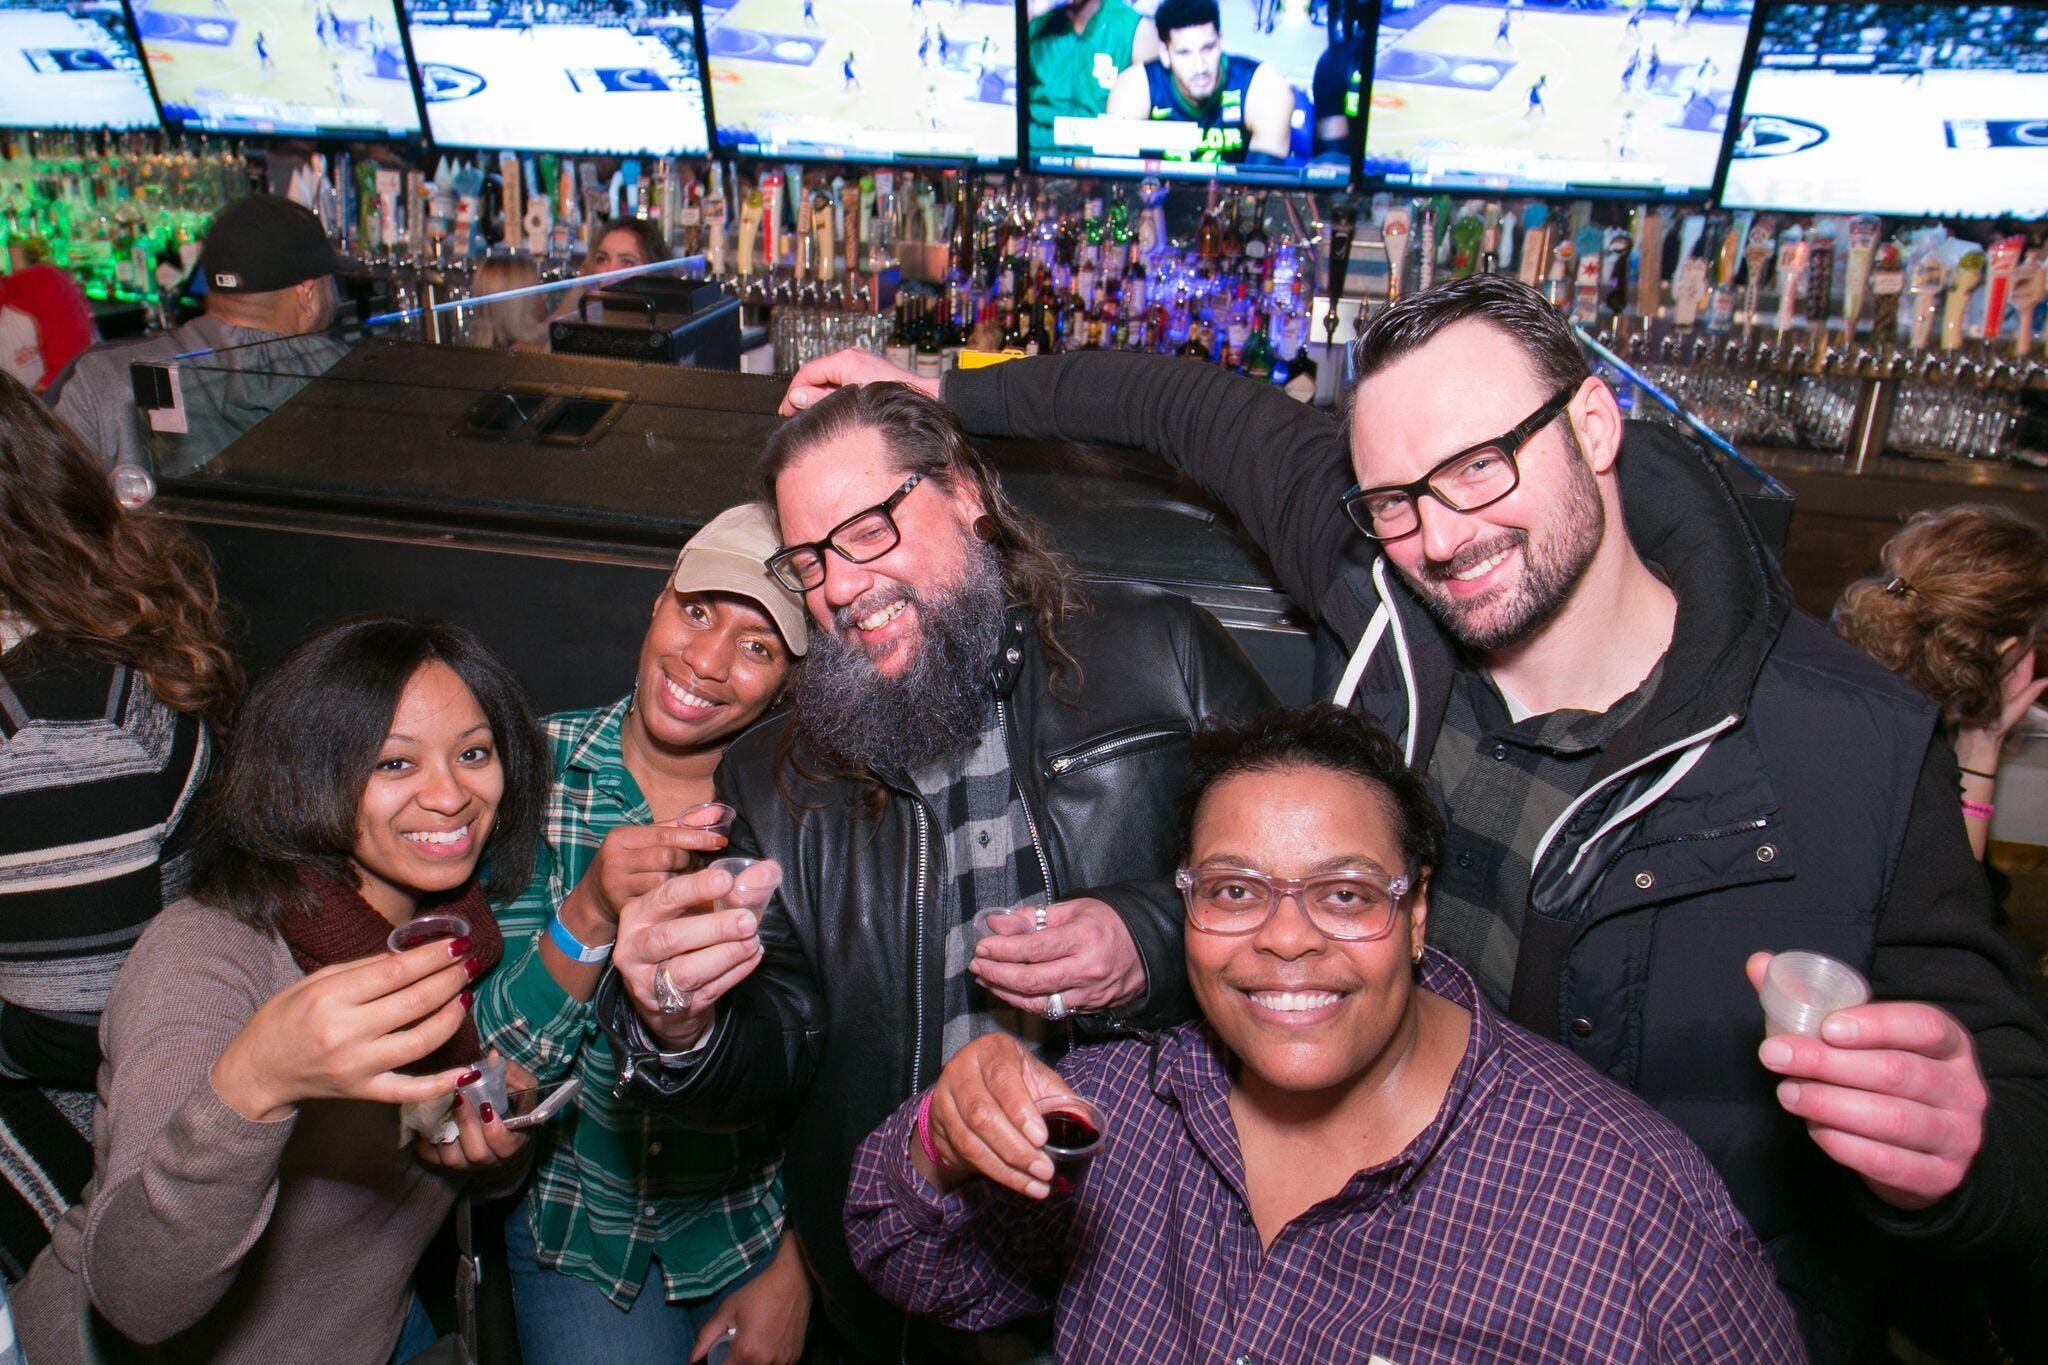 2019 Minneapolis Winter Whiskey Tasting Festi